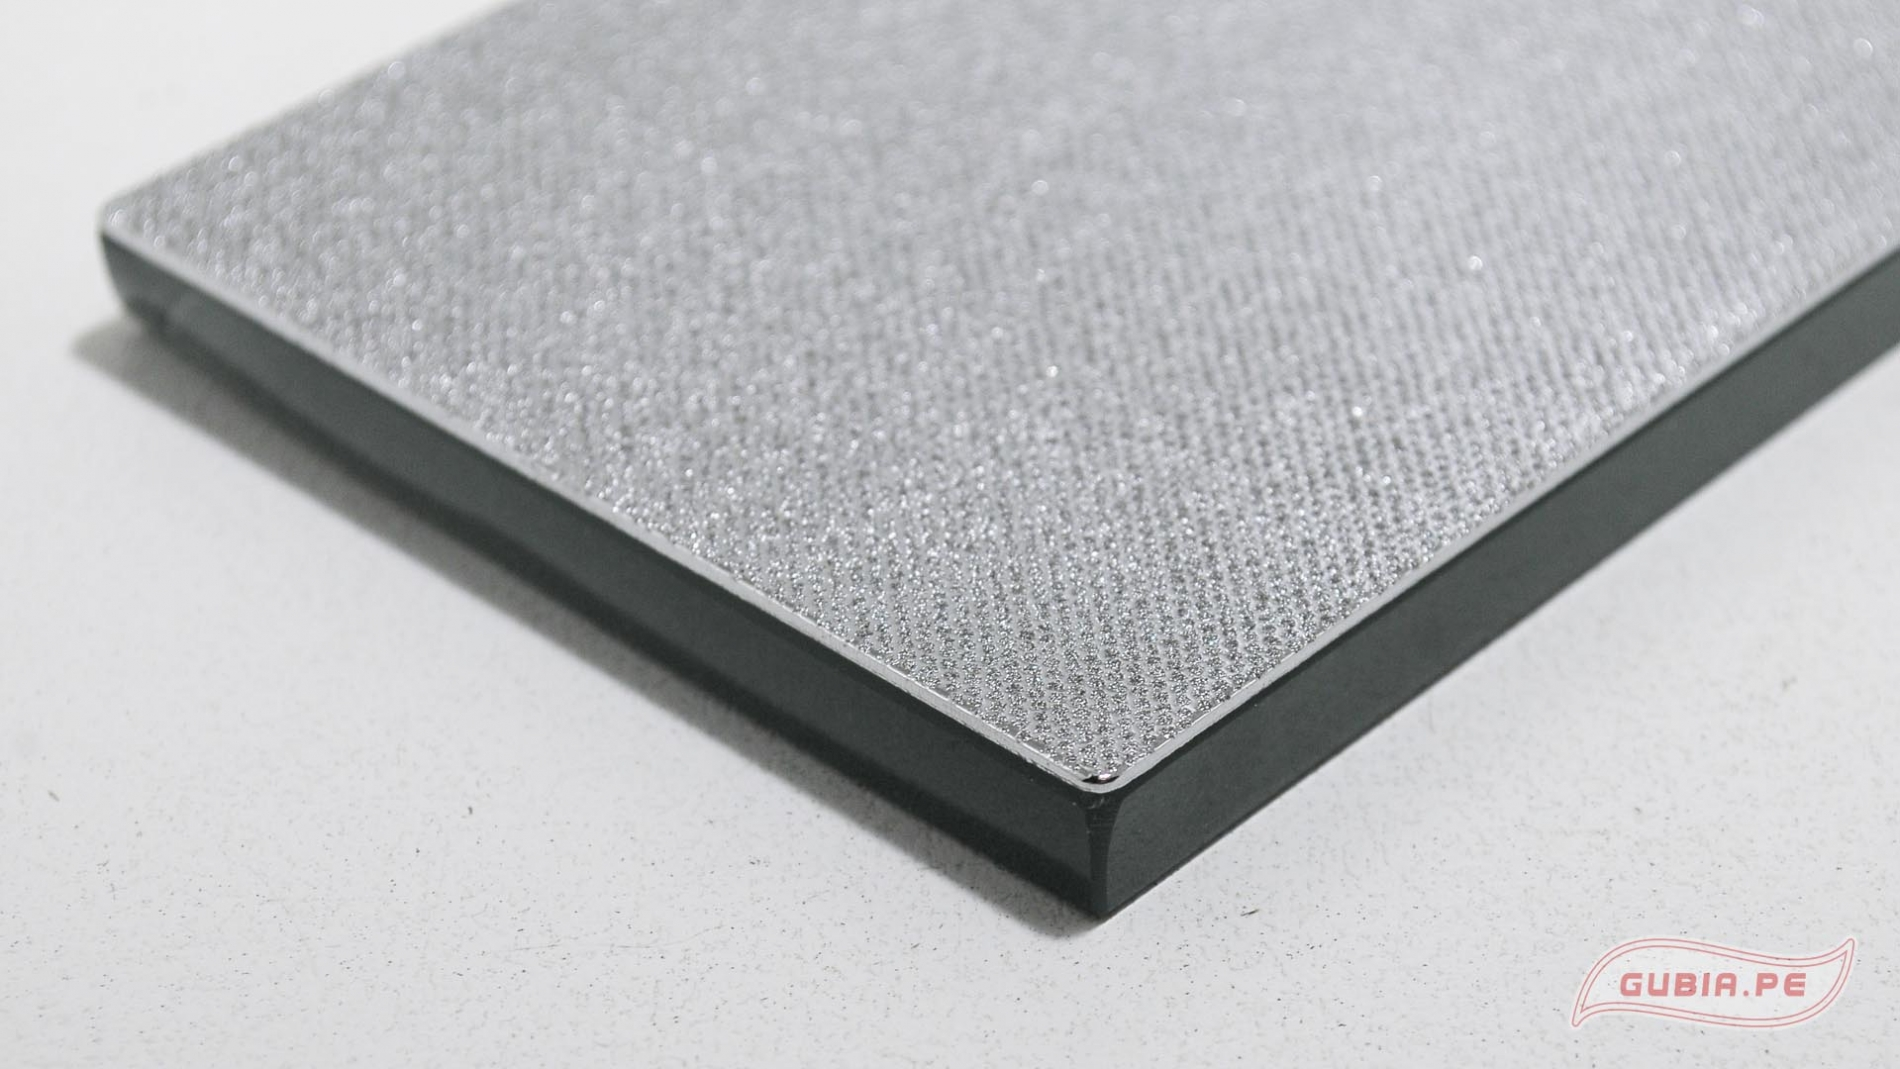 Atoma140-Atoma 140 aplanador de piedras de afilar 210x75 grano 140-max-1.